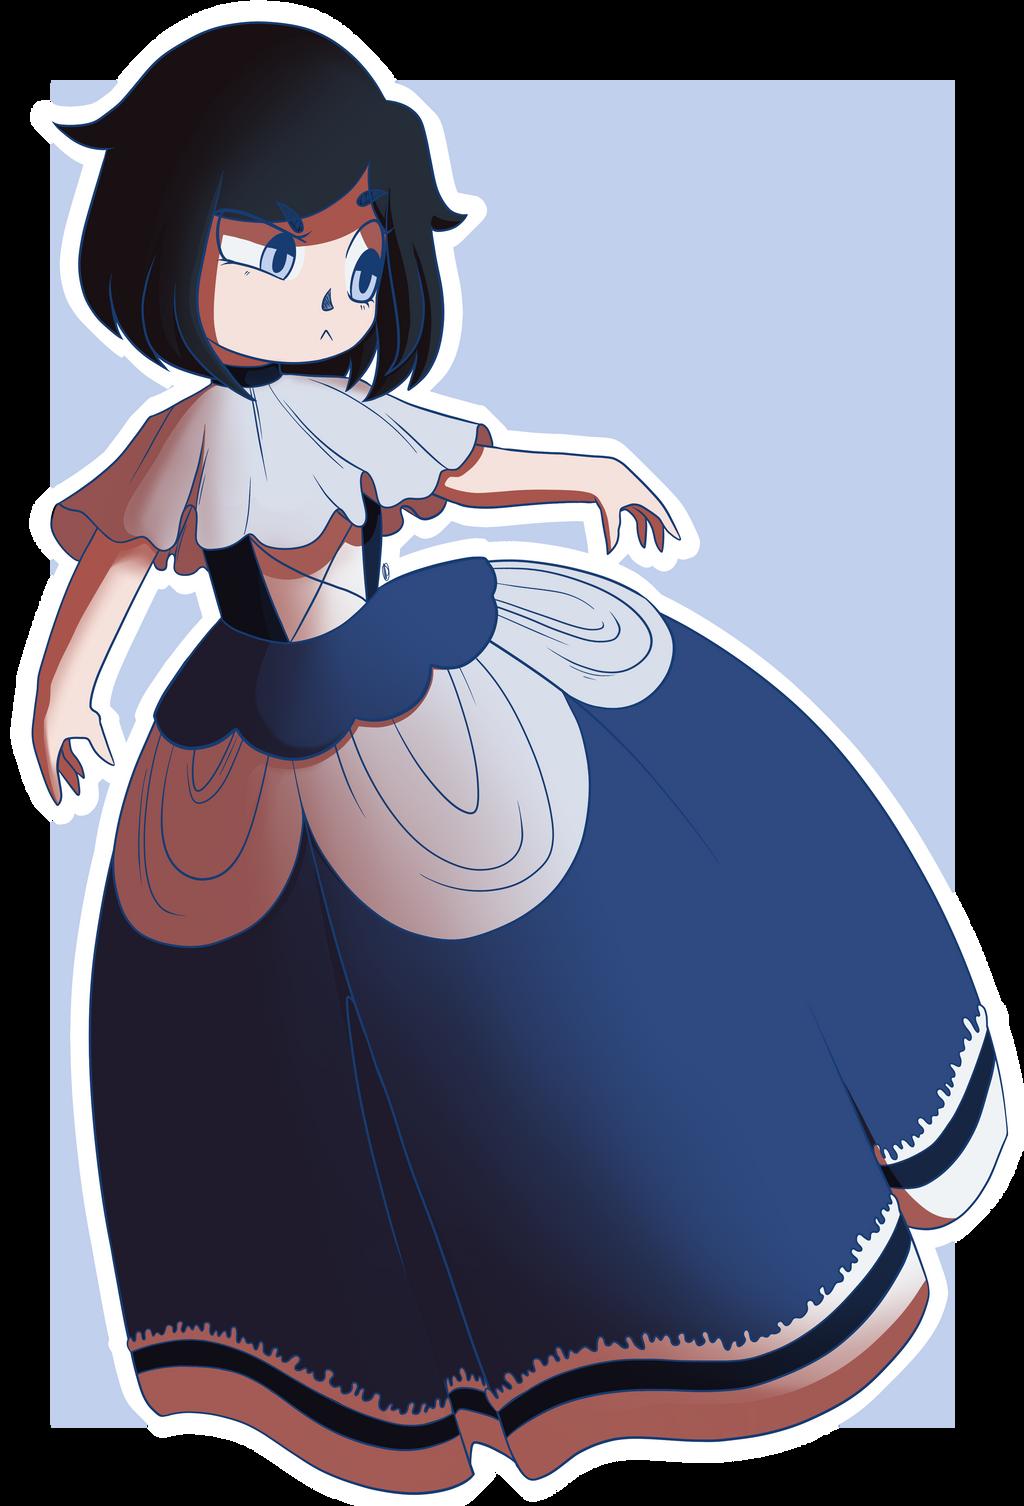 Dress by kangaroo722